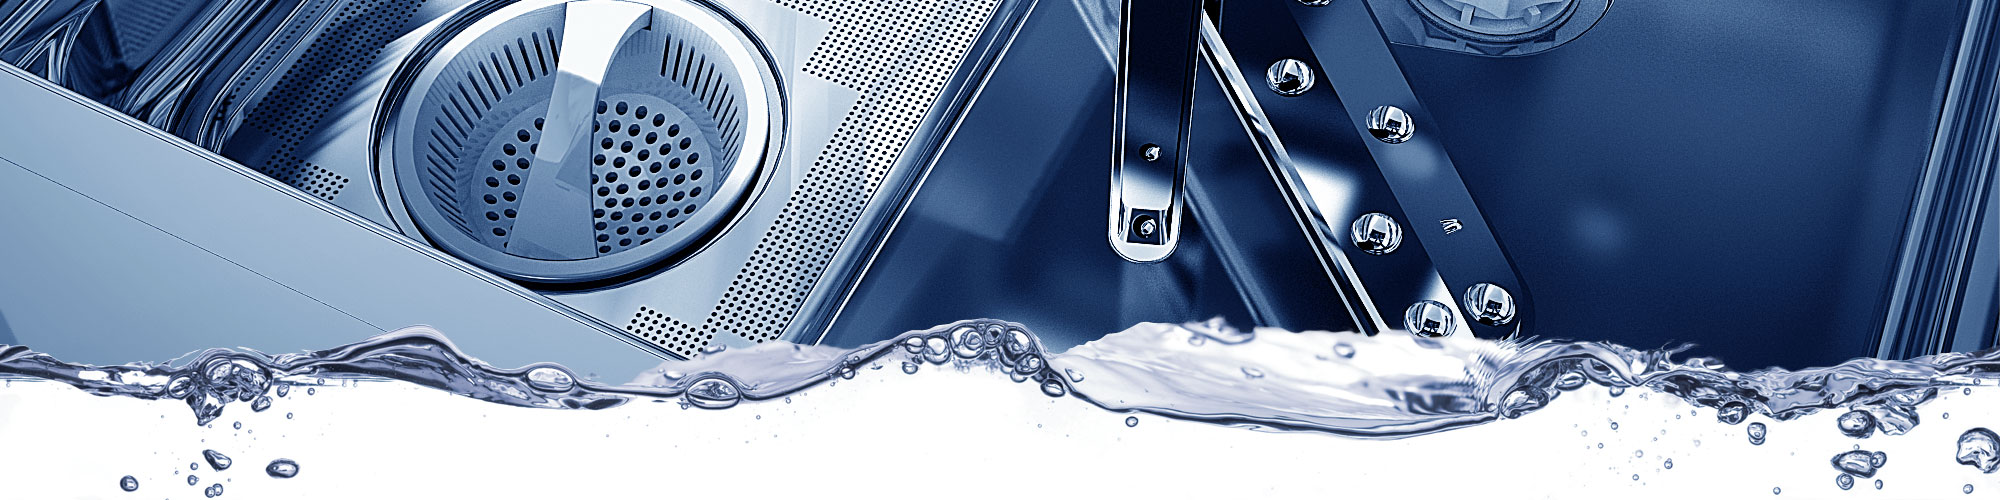 EVO generation dishwashers Fagor